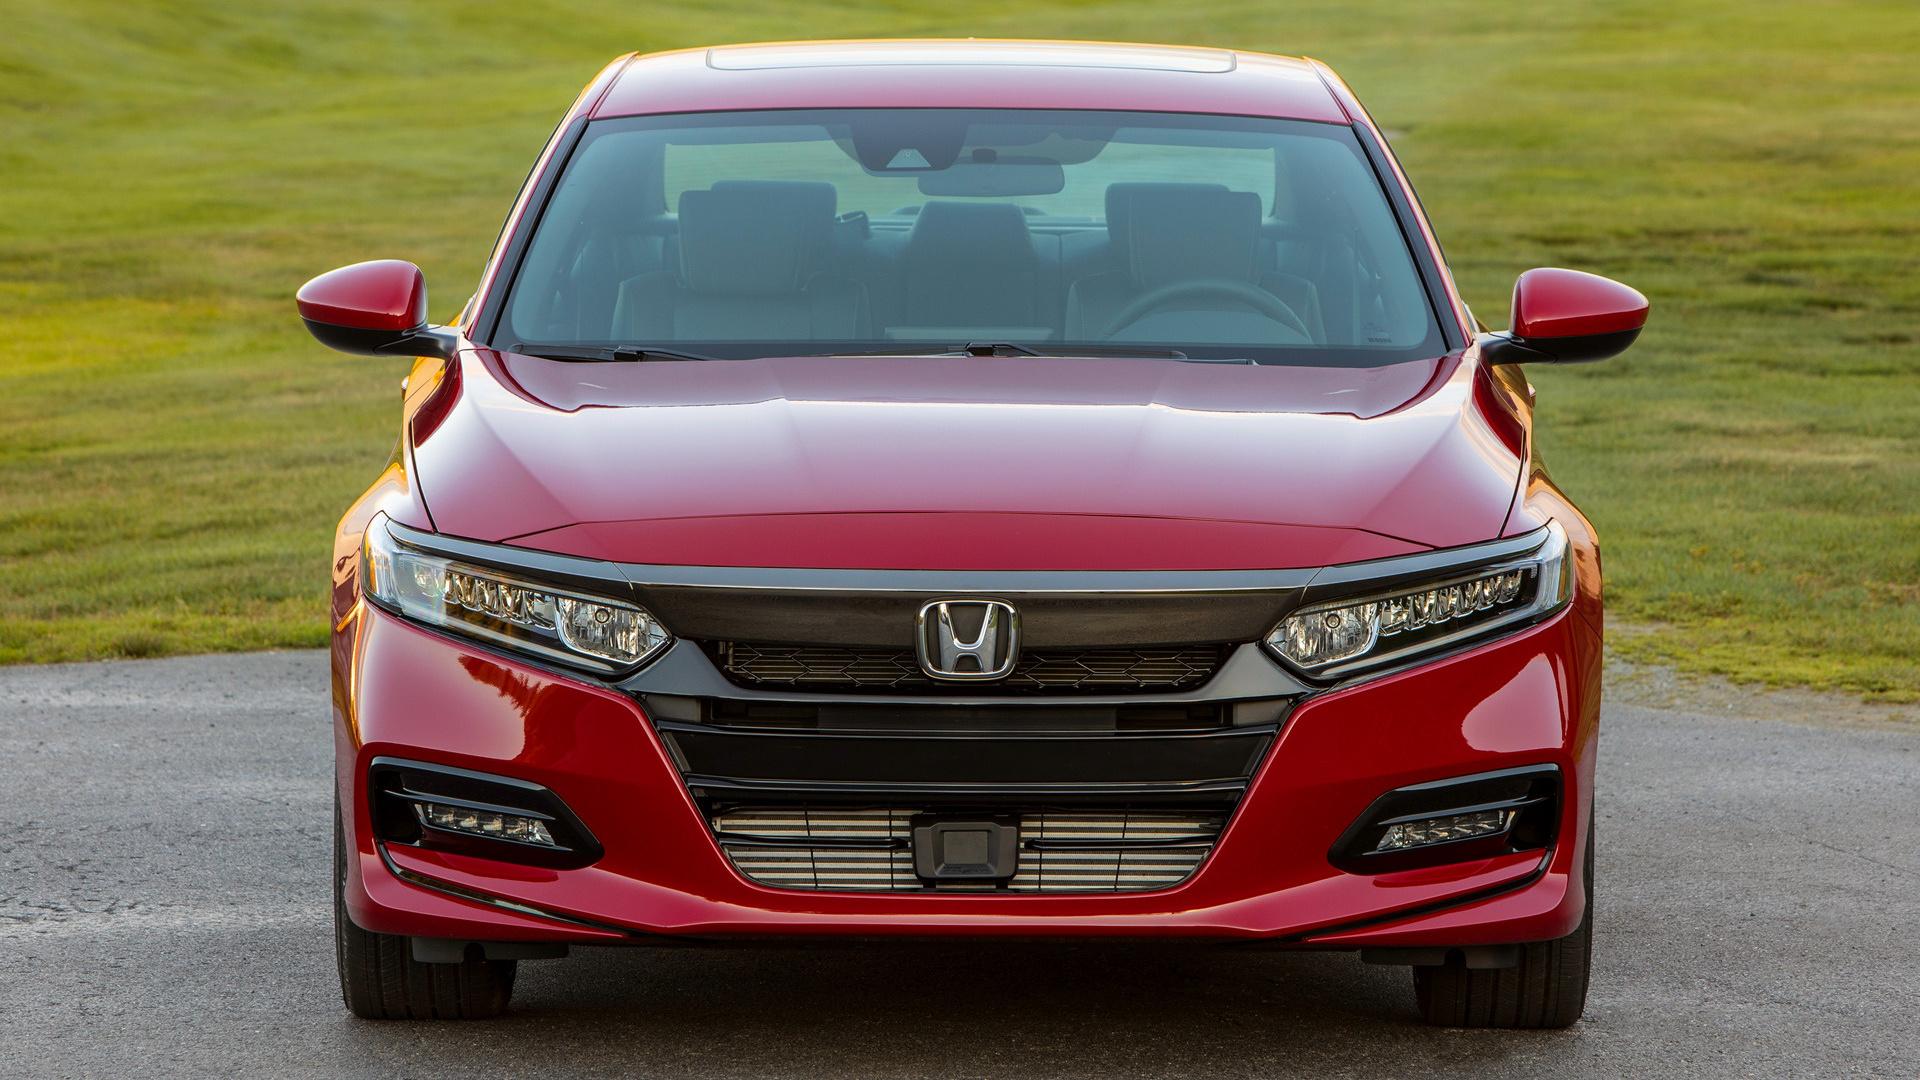 Honda accord sport 2018 wallpapers and hd images car pixel for Honda accord 201